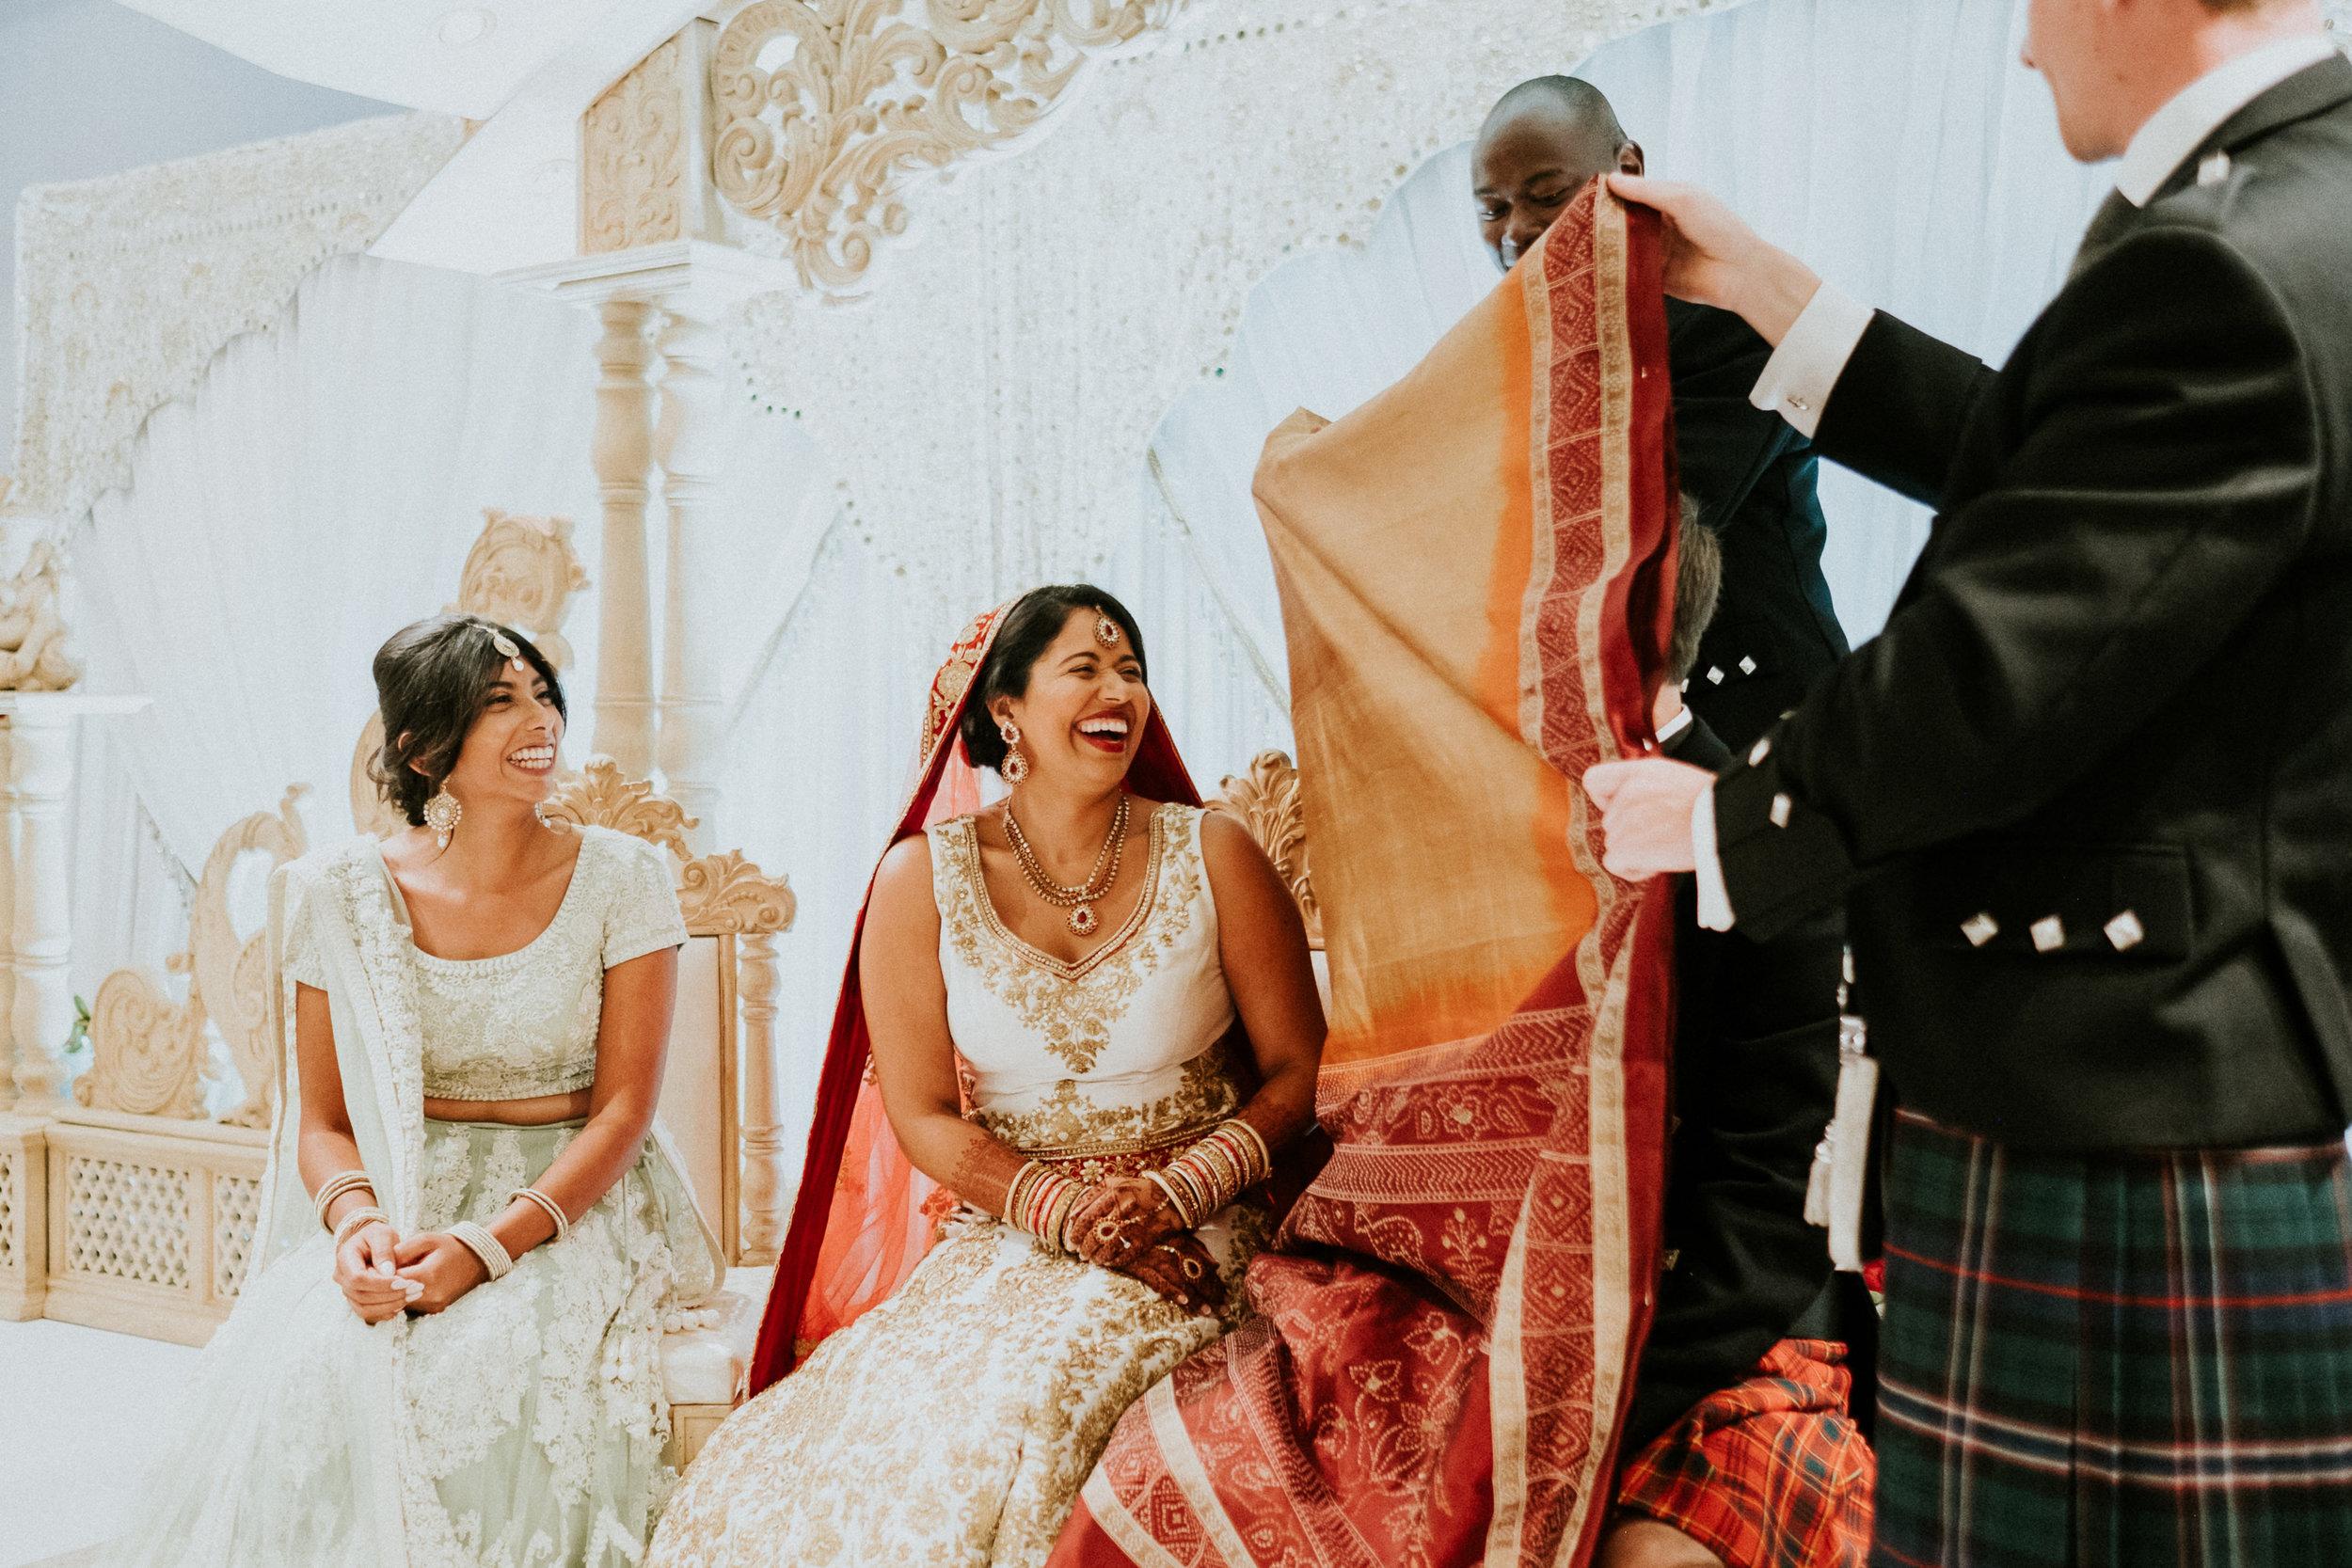 73 Indian fusion wedding alternative joanna nicole photography2.jpg